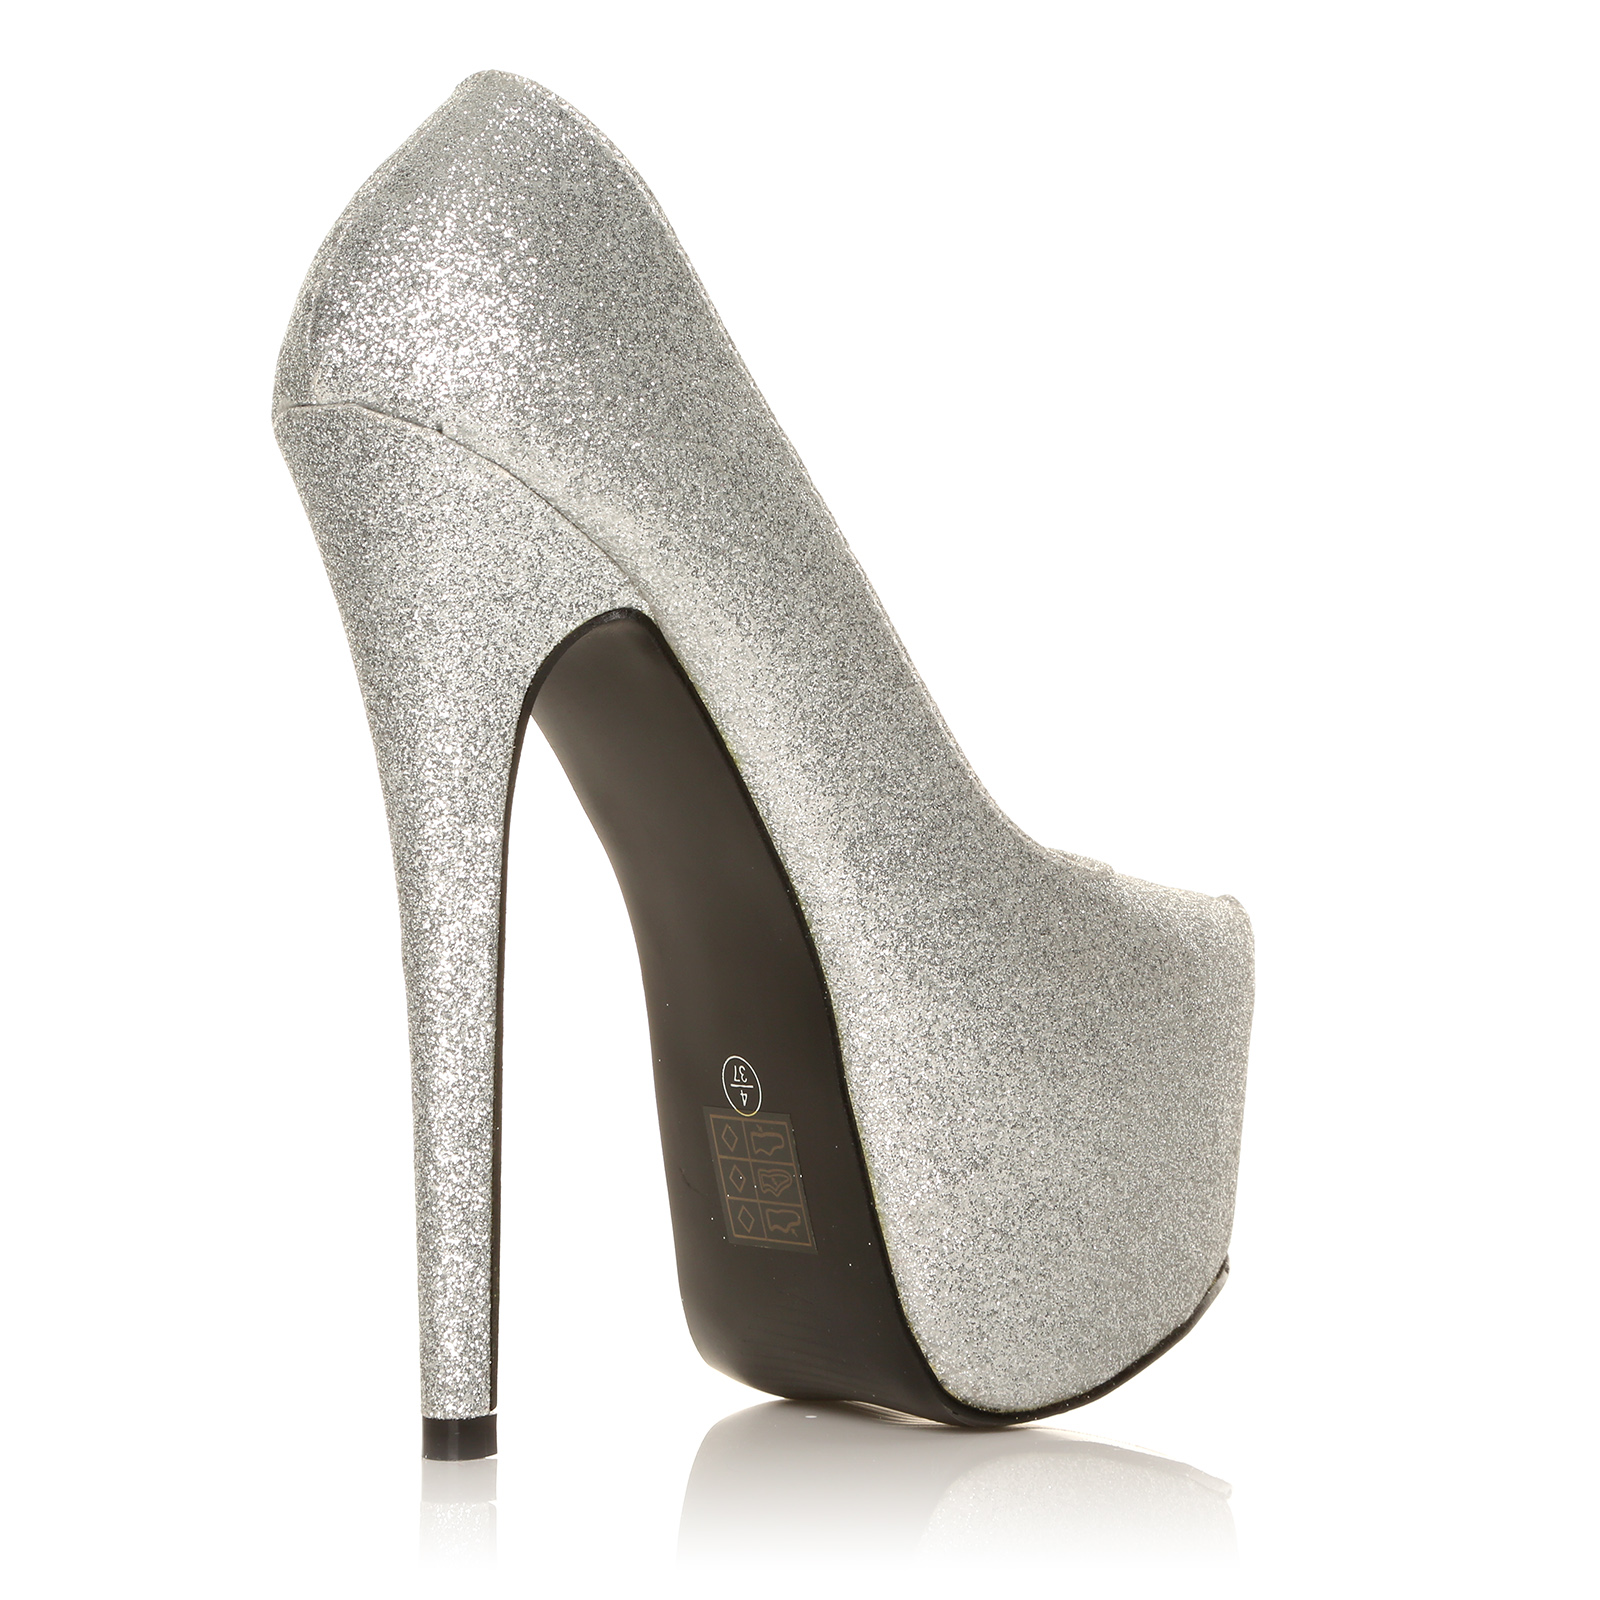 donna silver glitter stiletto very high heel platform. Black Bedroom Furniture Sets. Home Design Ideas